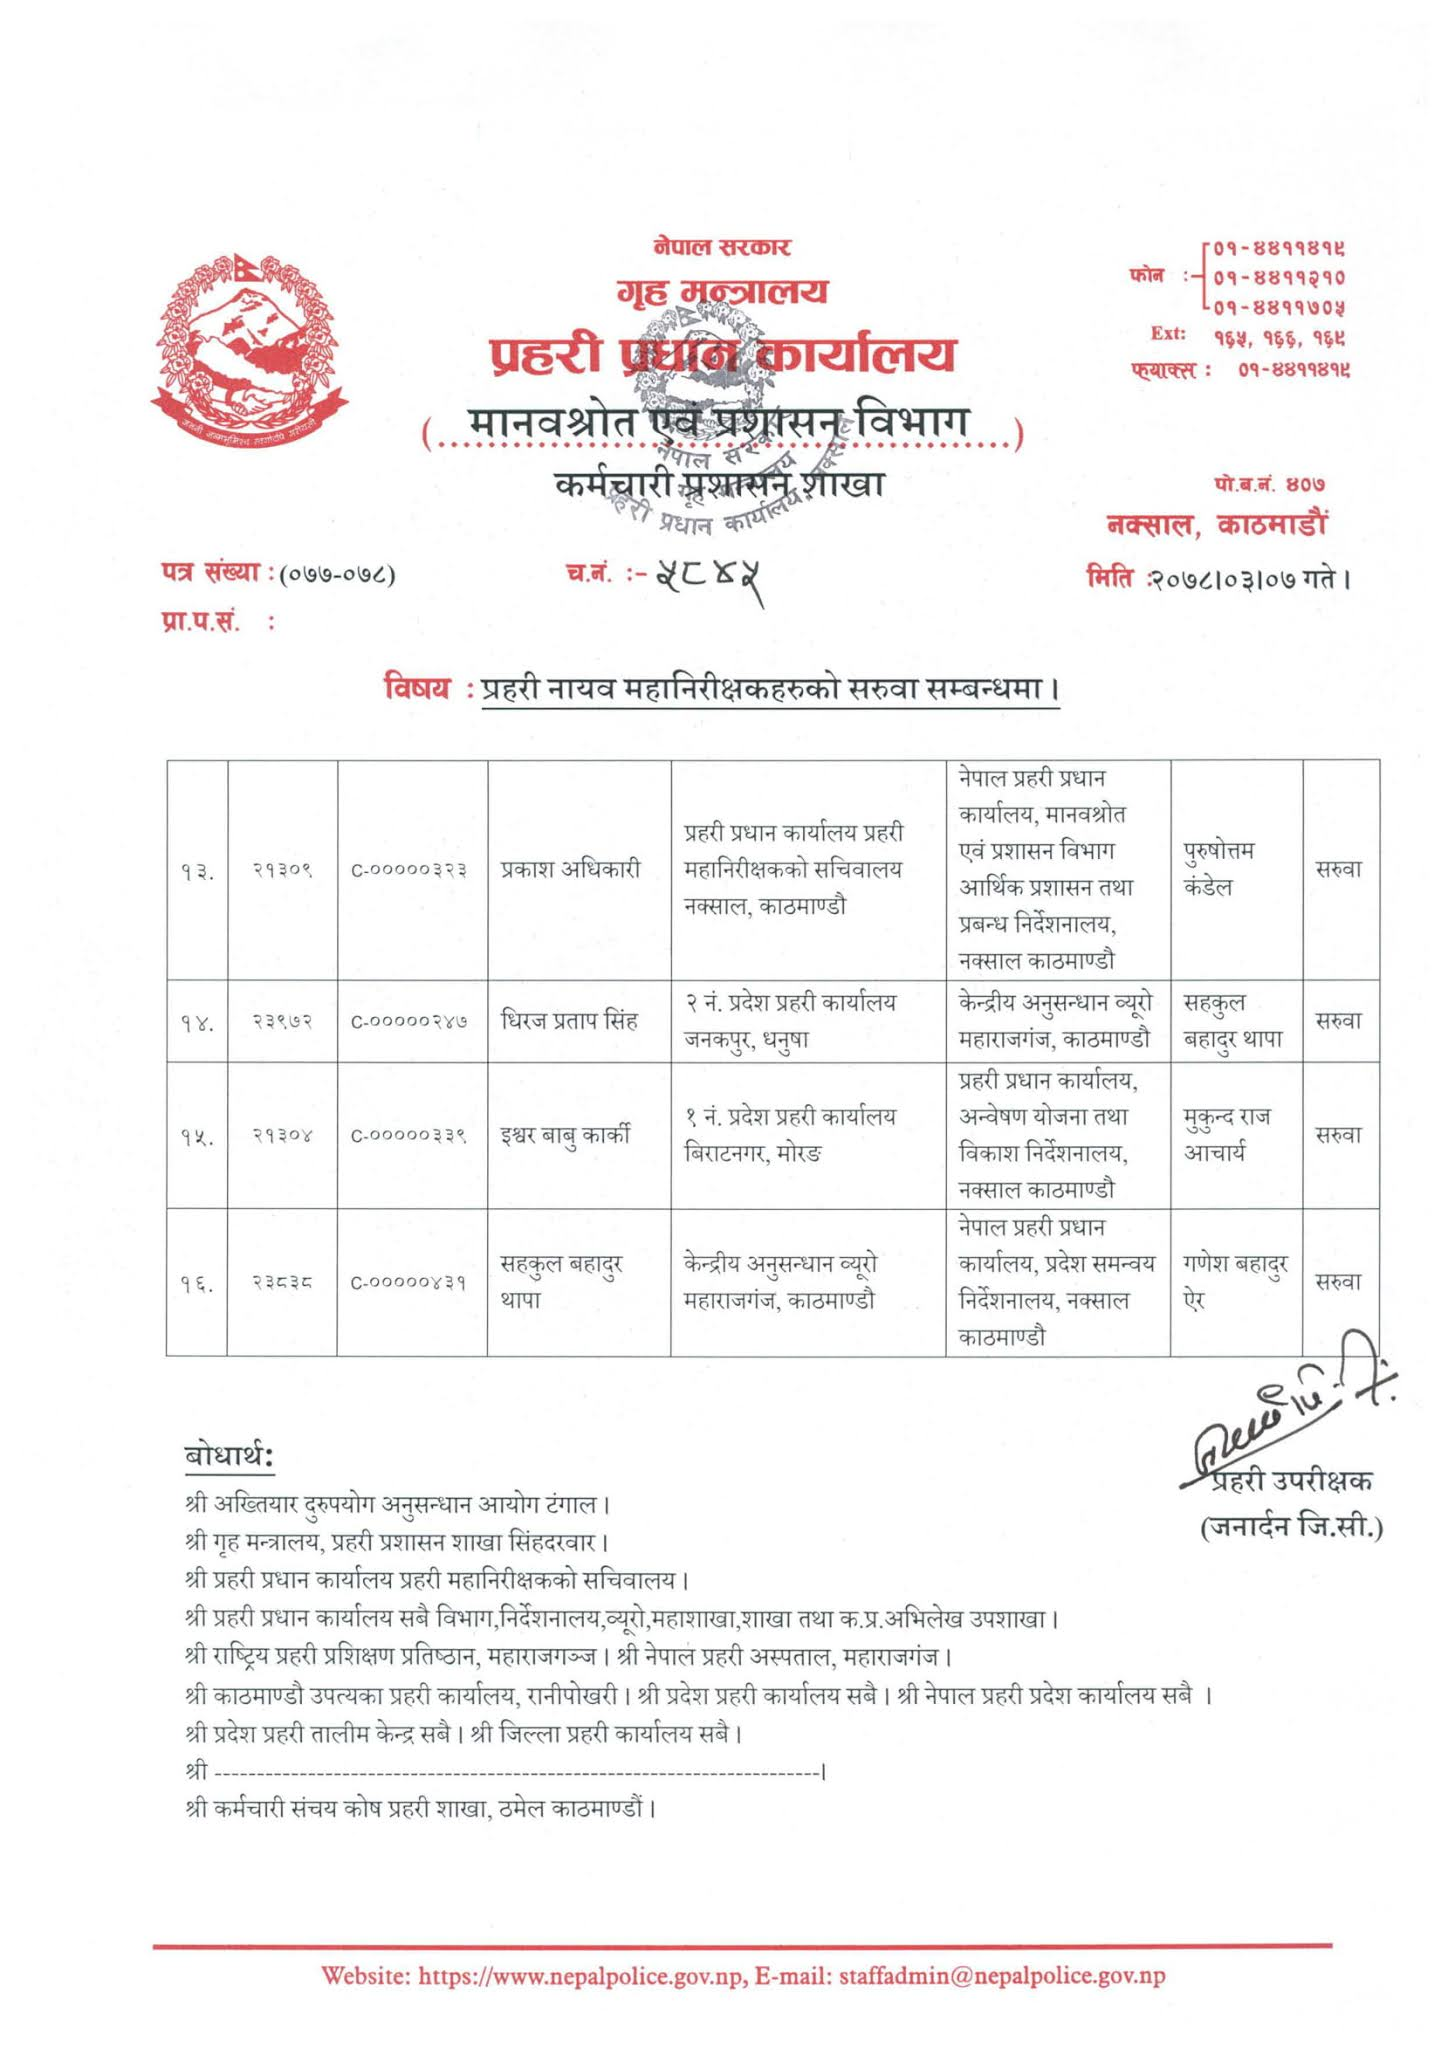 Transfer of  Deputy Inspector General of Police (DIG)